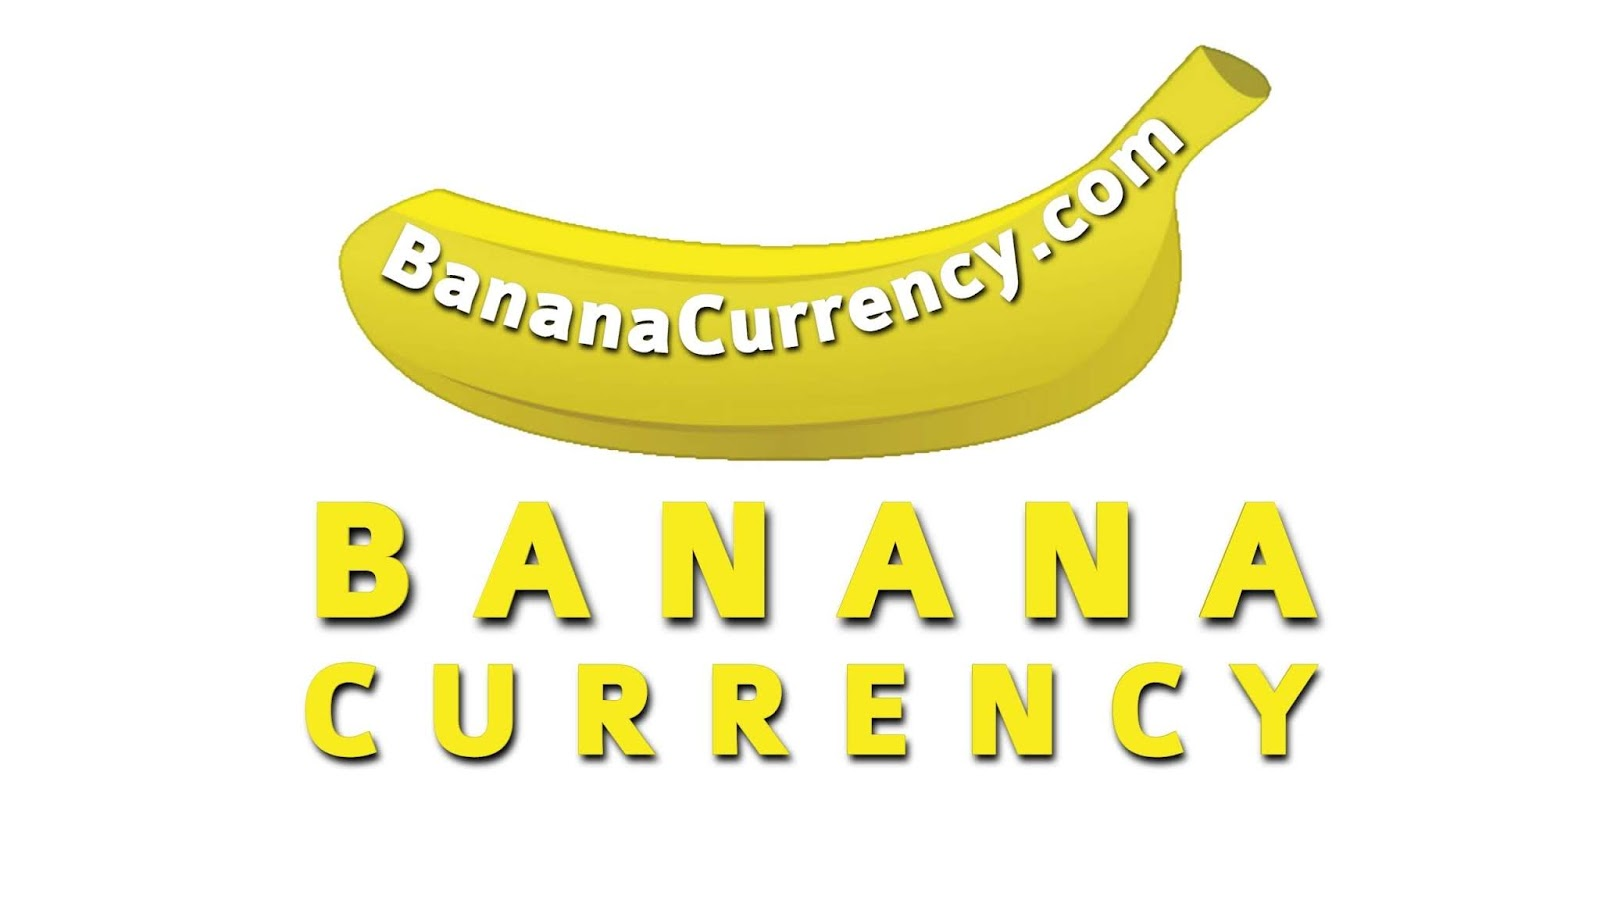 BananaCurrency.com